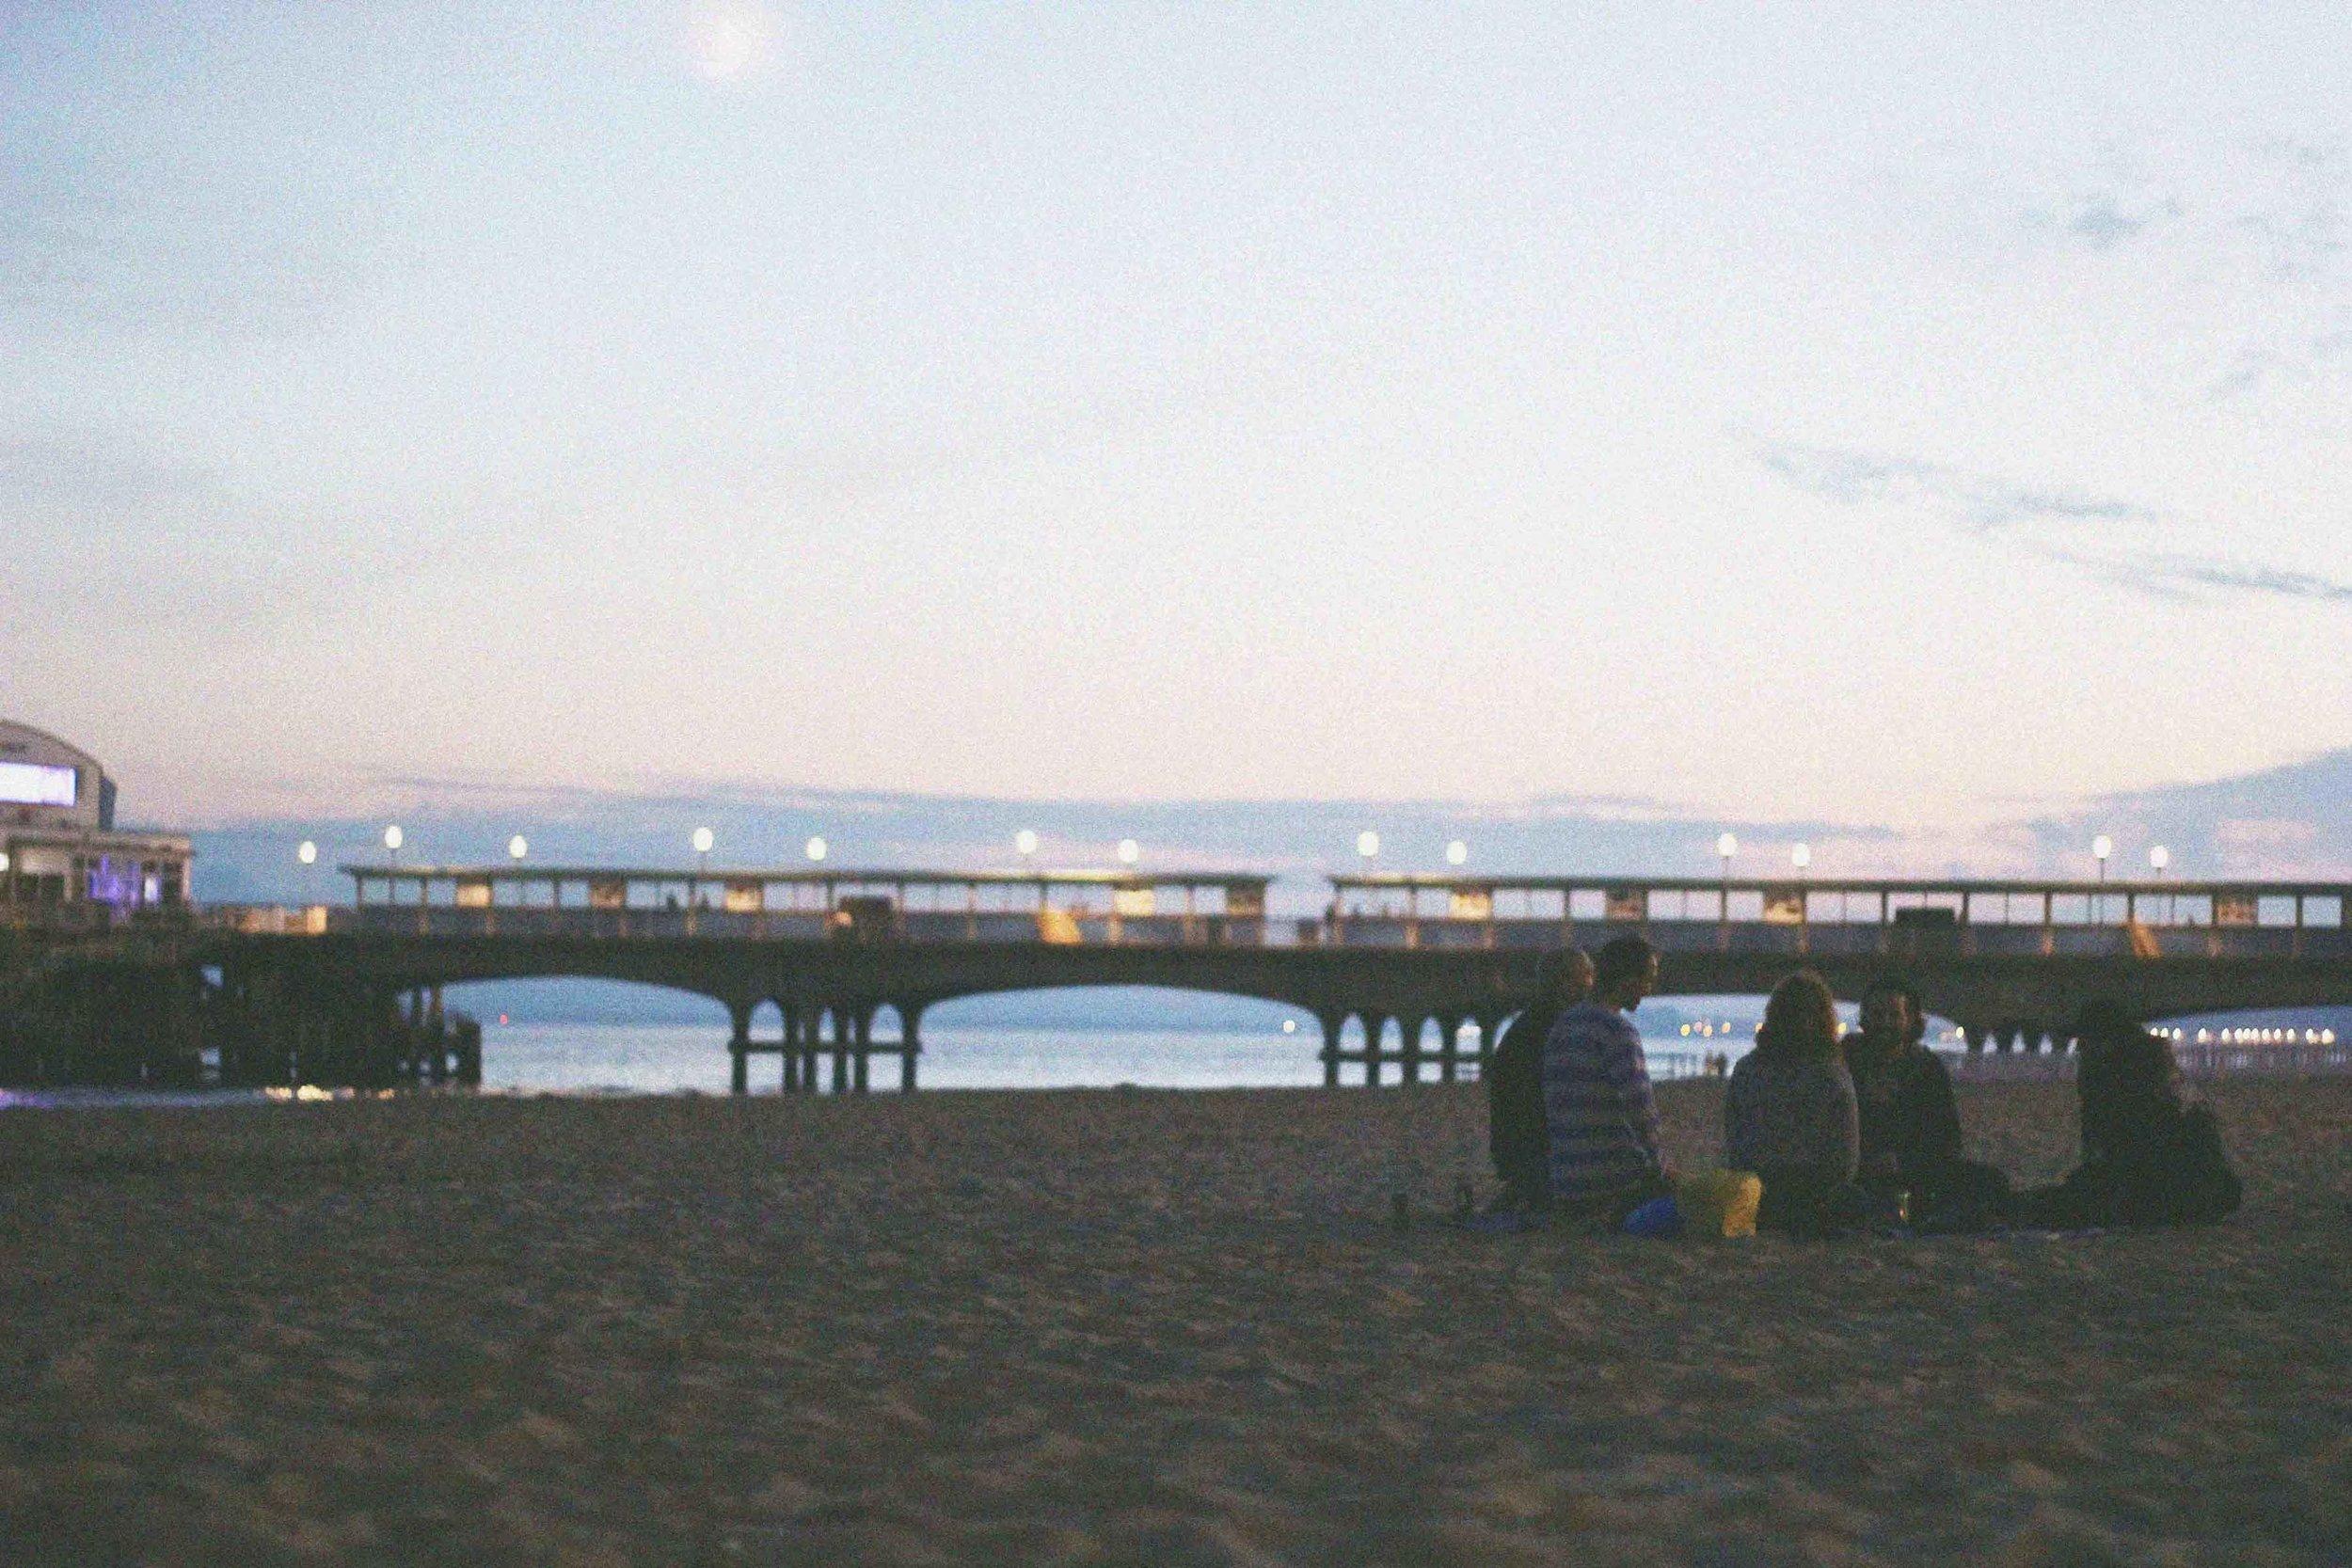 Jordan_Bunker_BBQ_beach_and_Affligem_beer_14.jpg